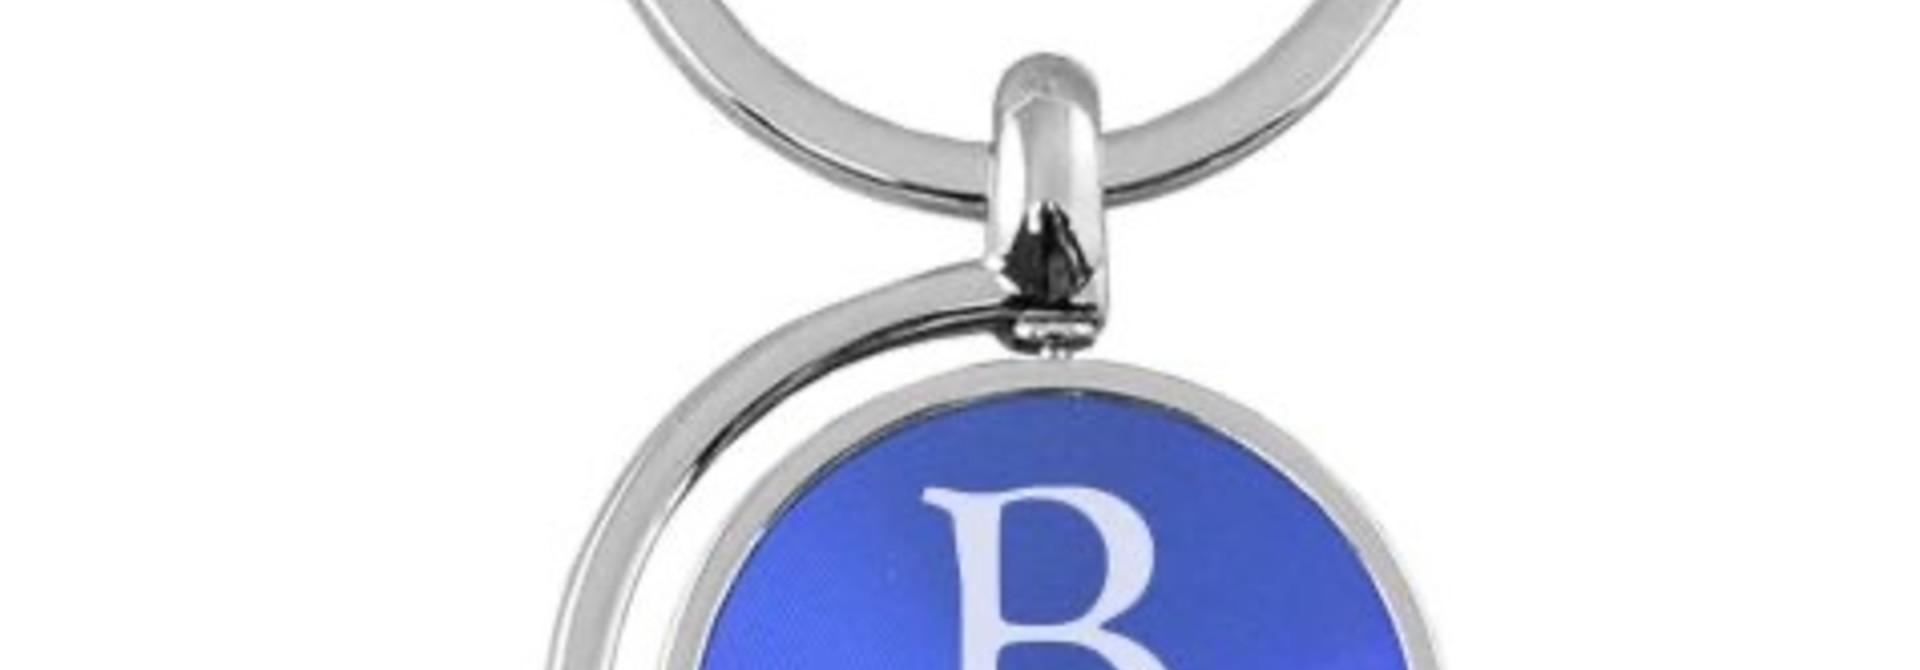 Spinning BC logo Key Chain